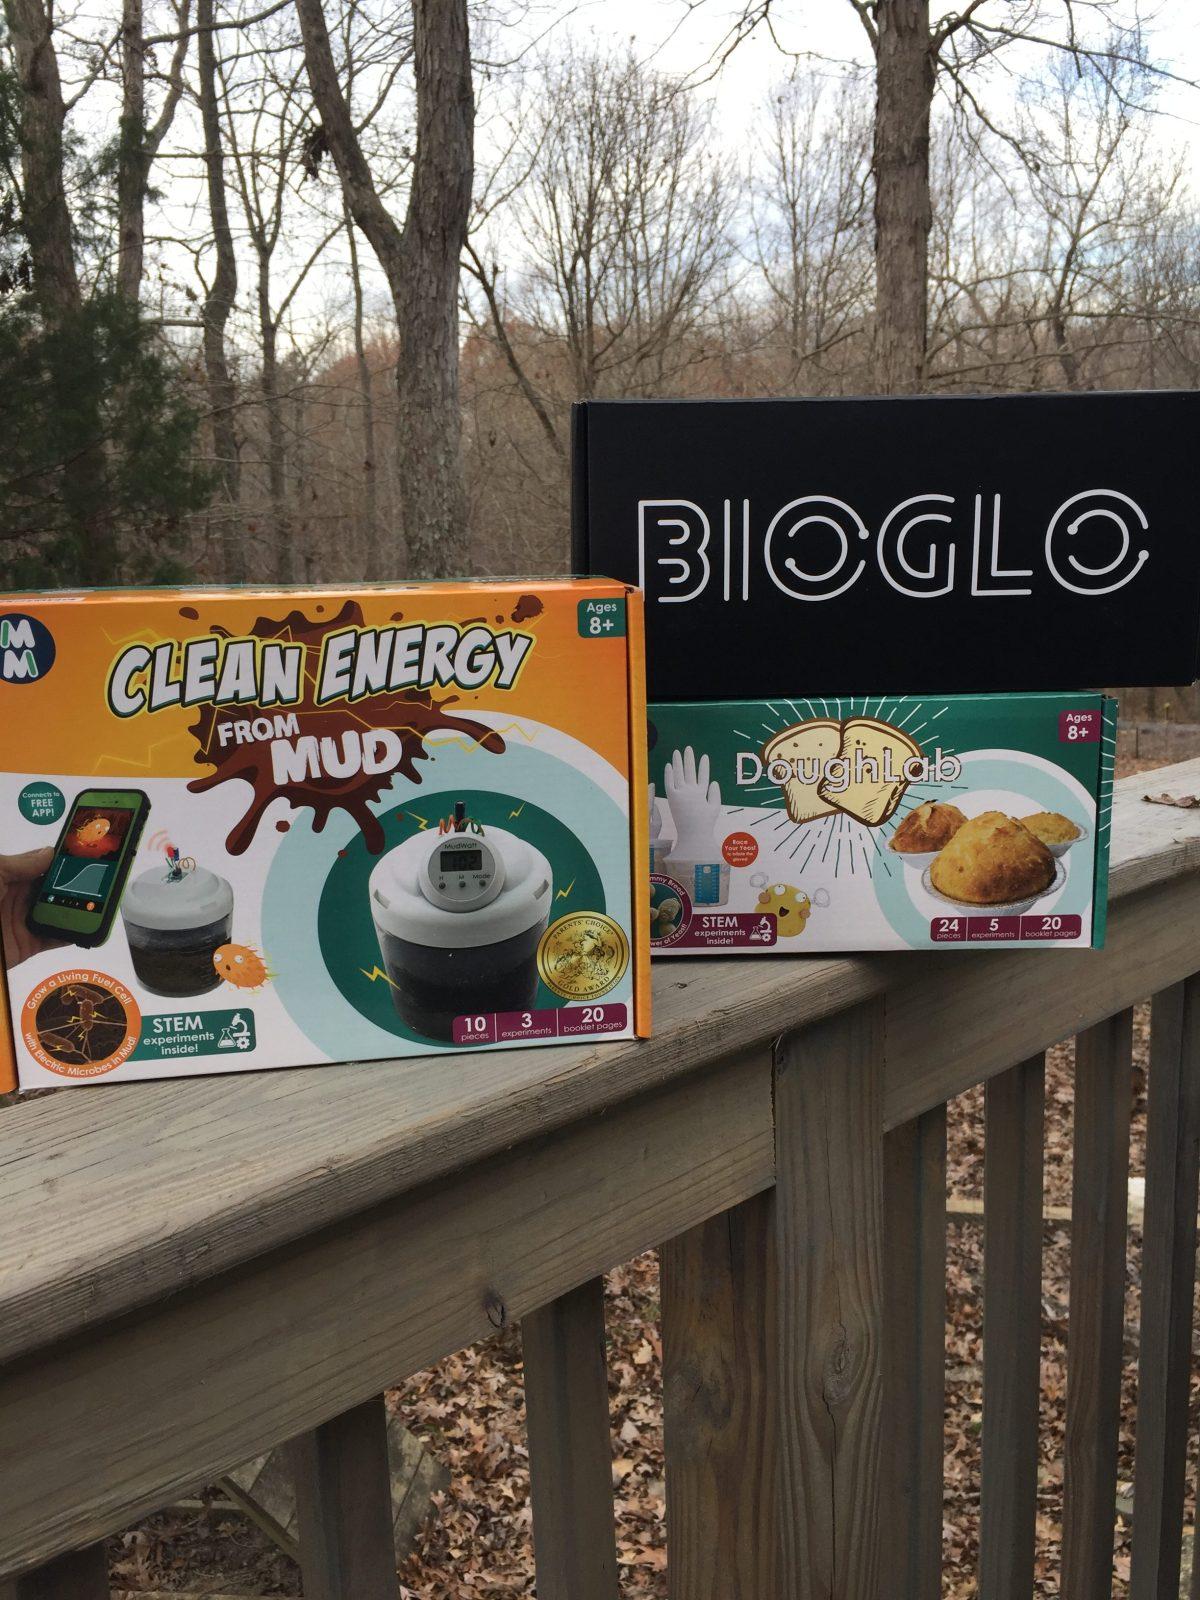 Bioglow, Muddwatt, doughlab